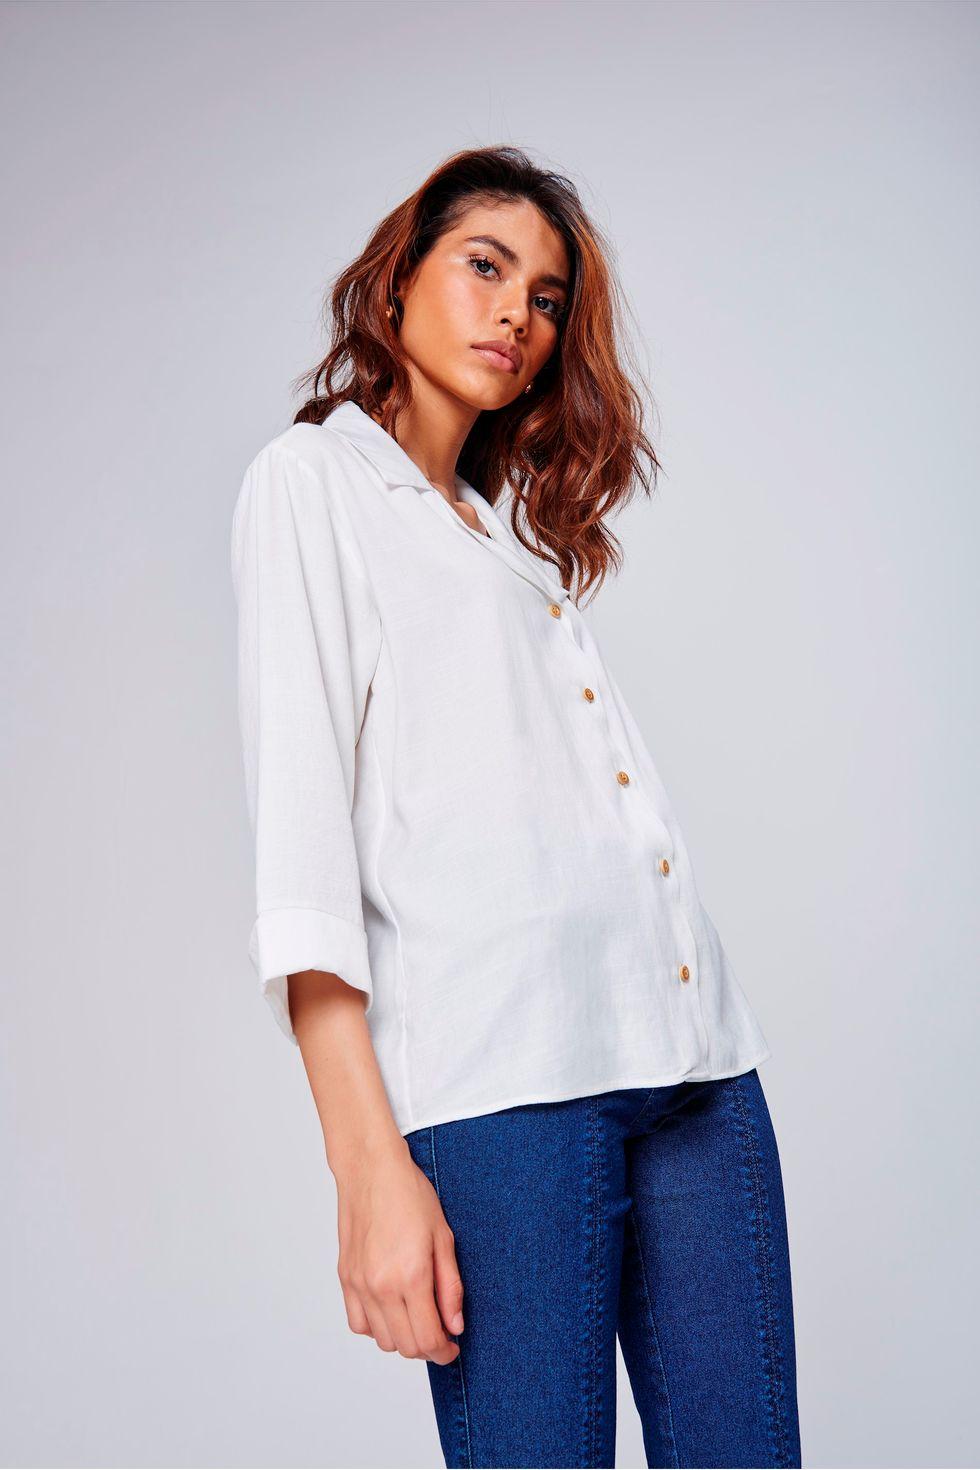 Camisa-Social-Feminina-Frente--